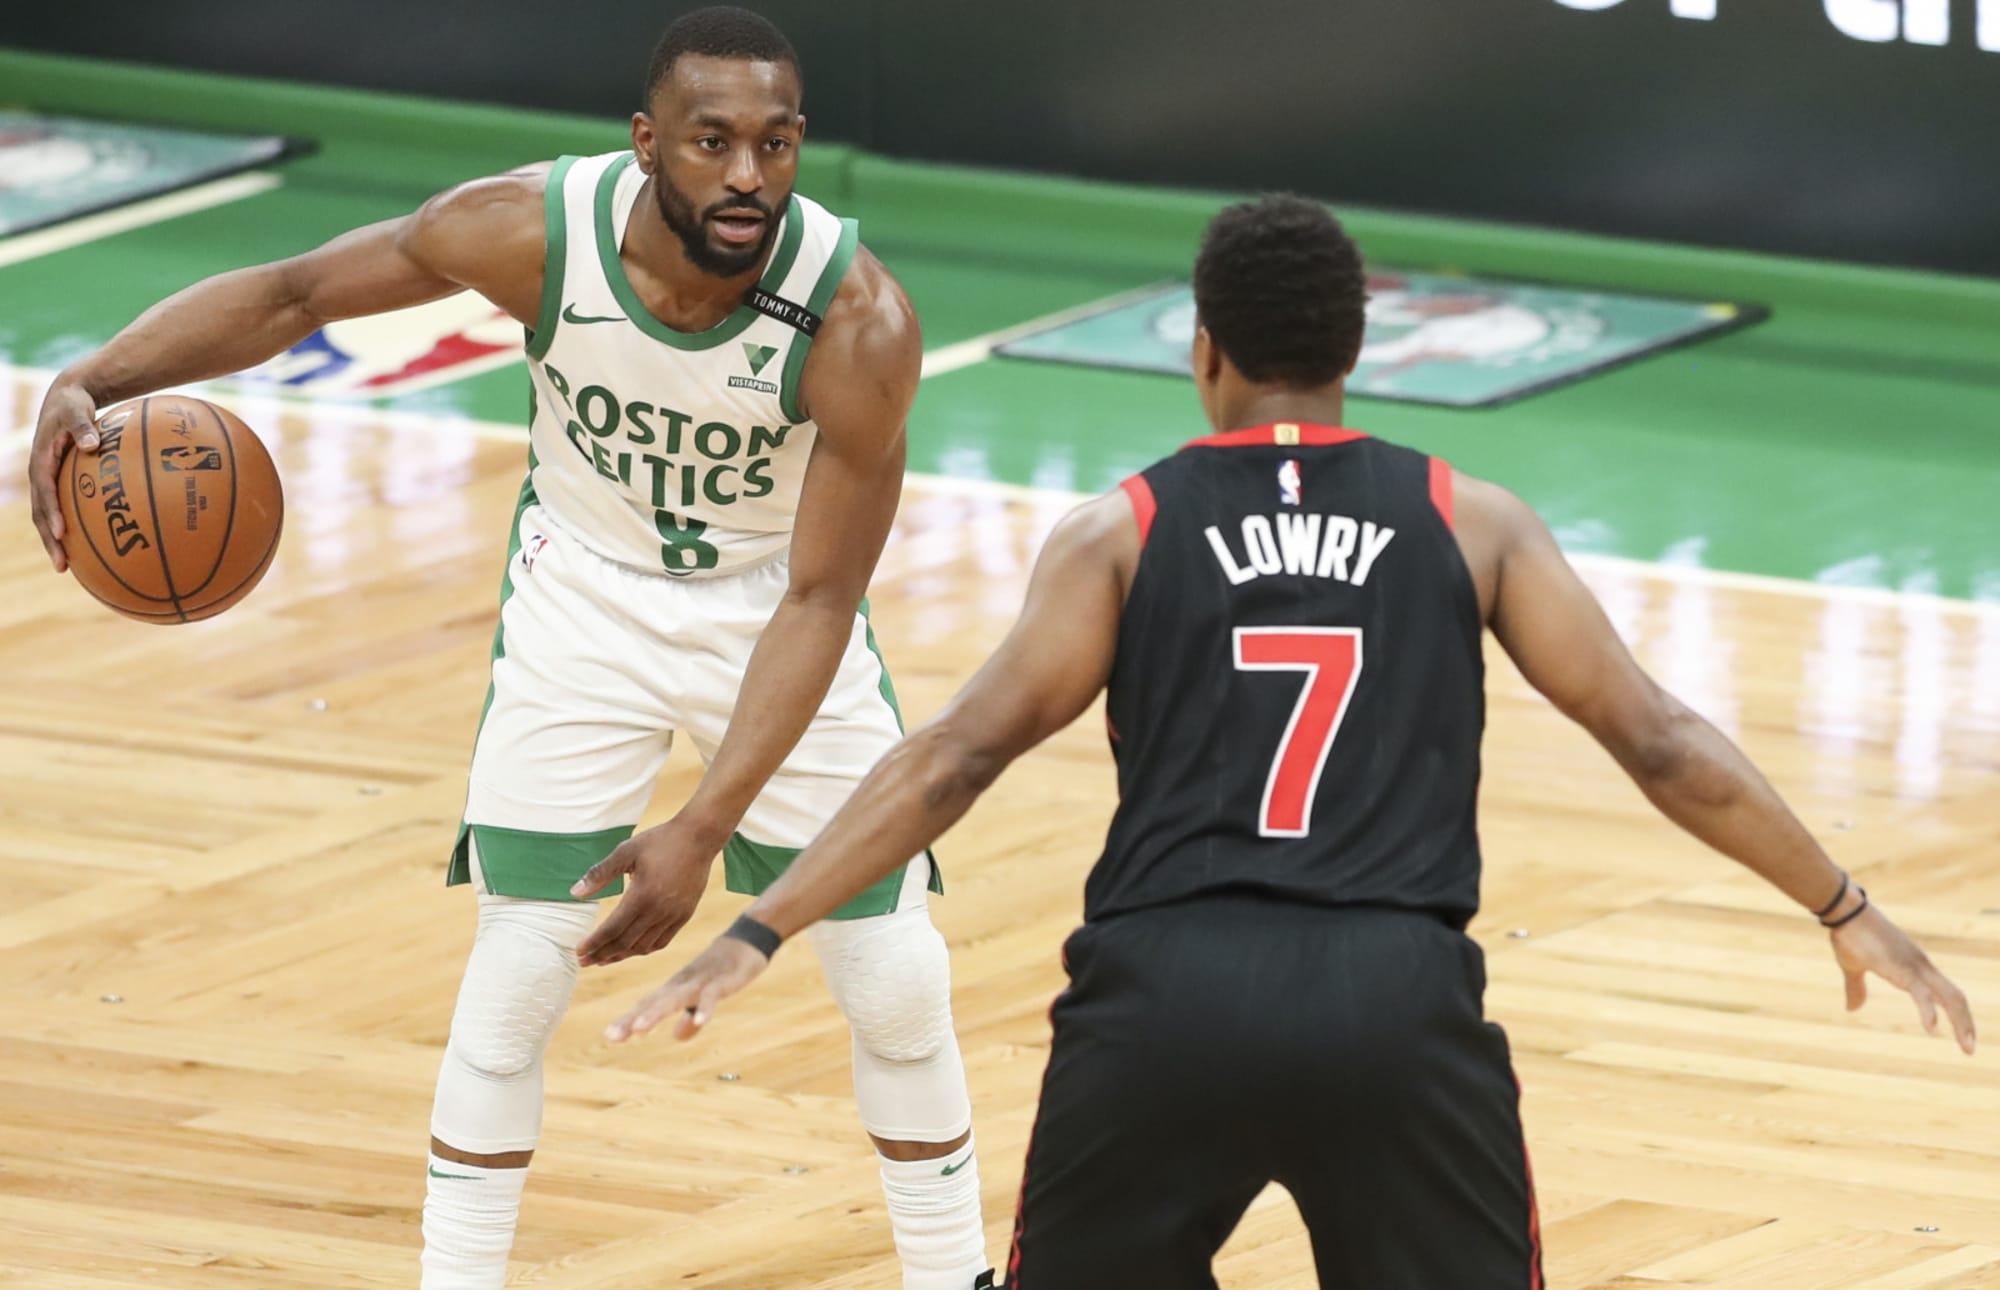 Toronto Raptors: Best trade in team history with Boston Celtics